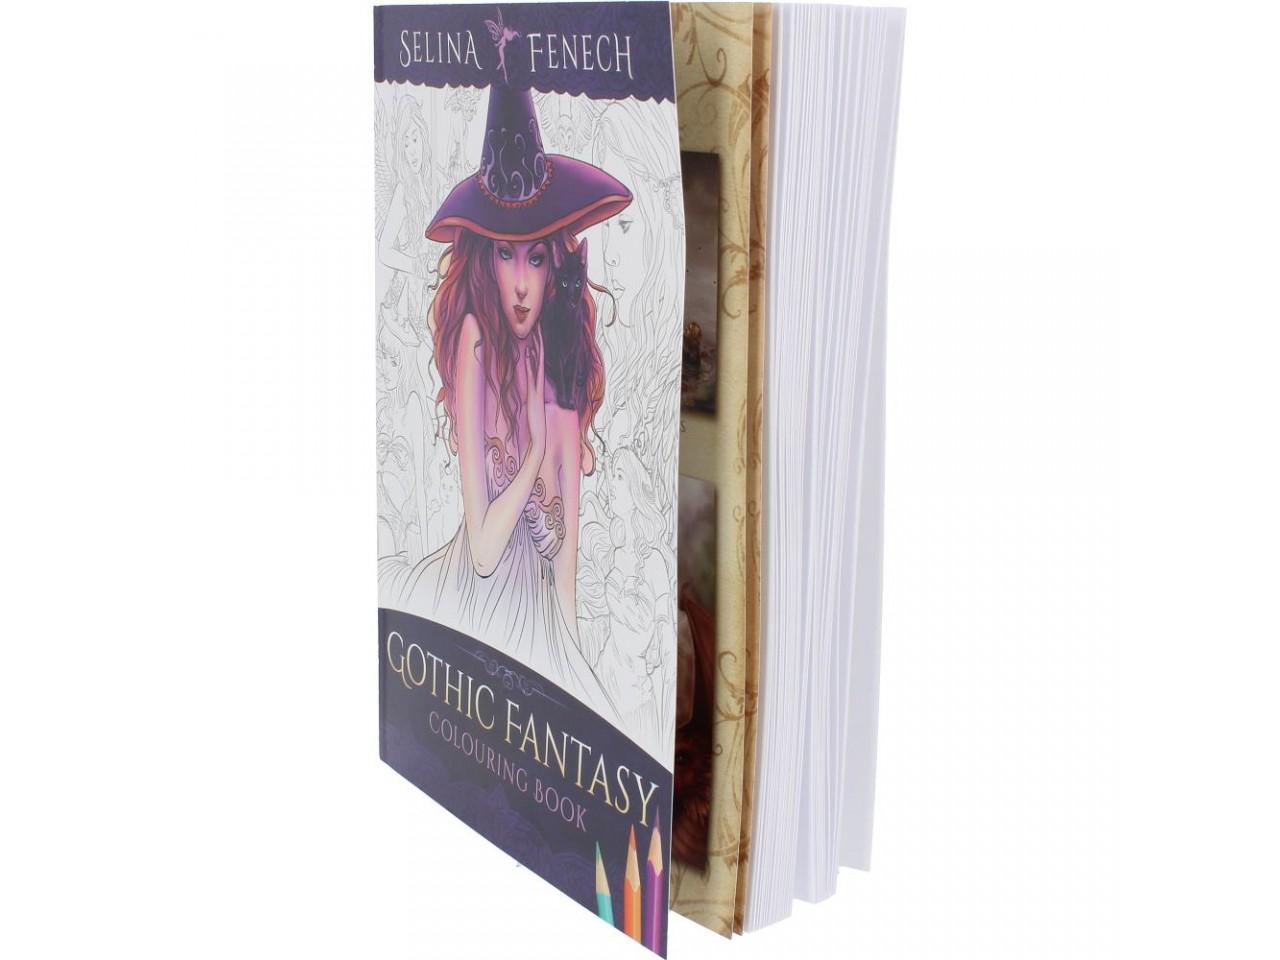 Kolorowanki Relaksacyjne Gothic Fantasy Selina Fenech Nemesis Now